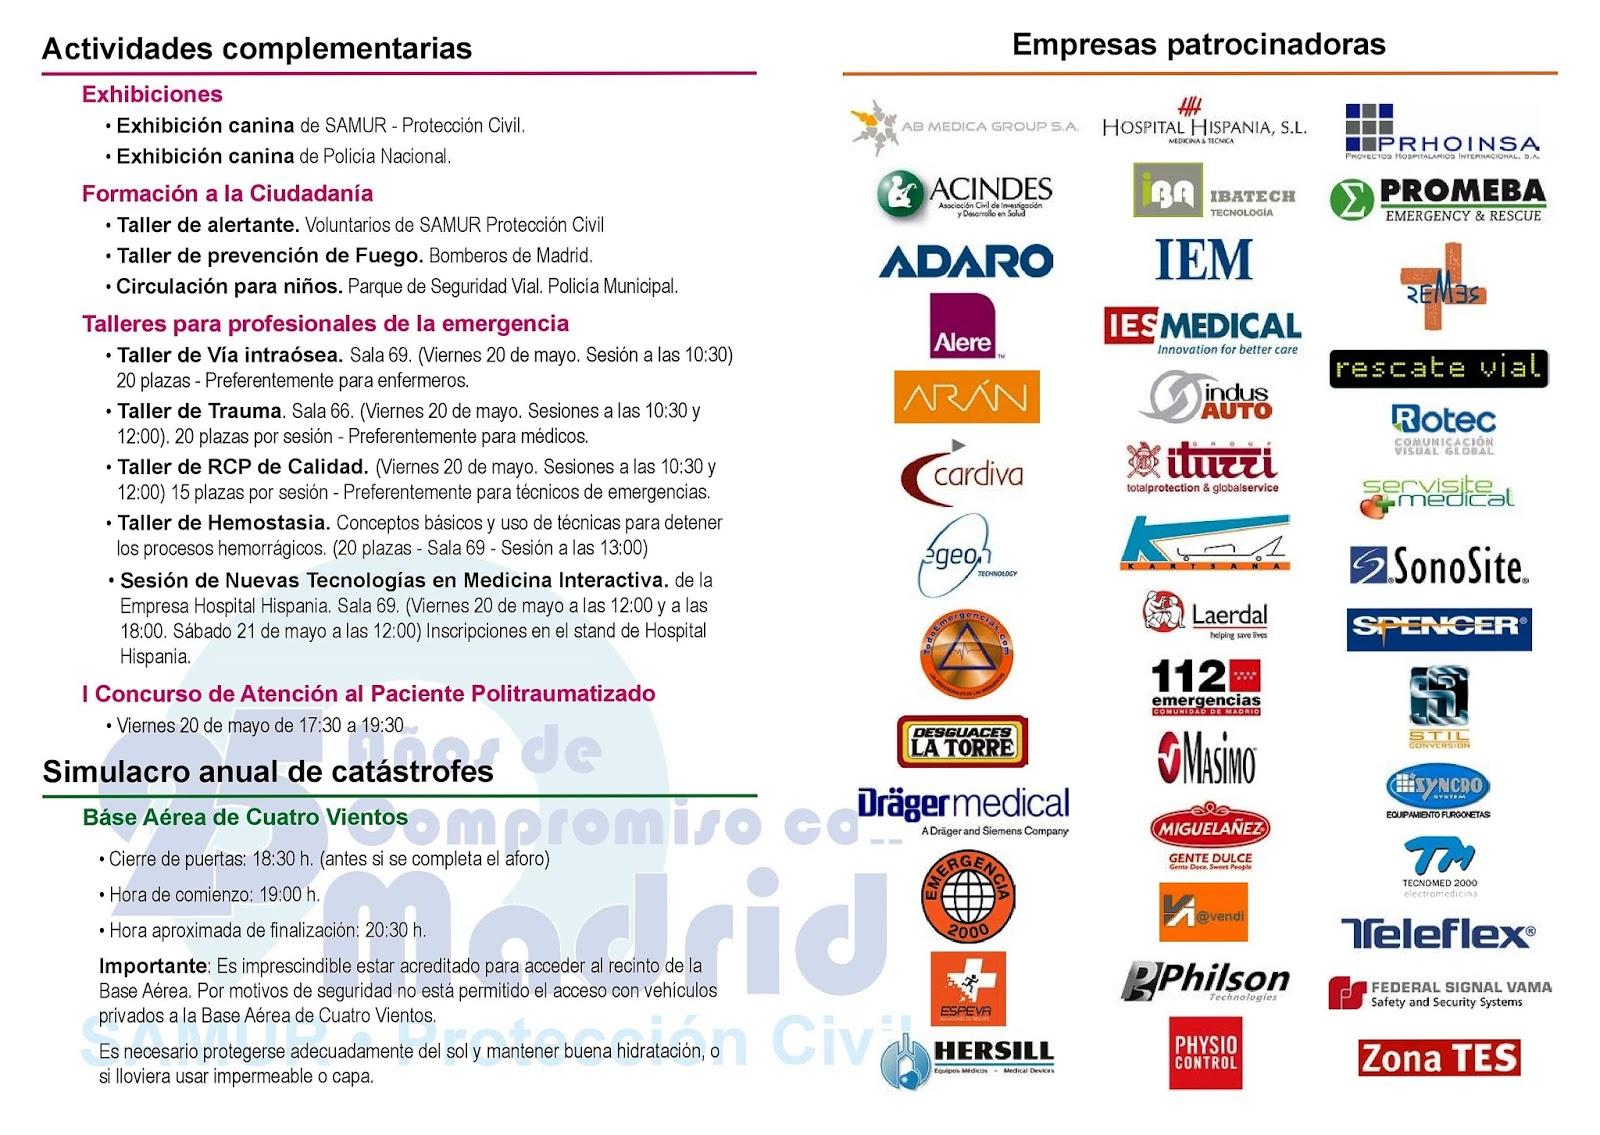 Ems solutions international marca registrada xxiii for Marca municipales